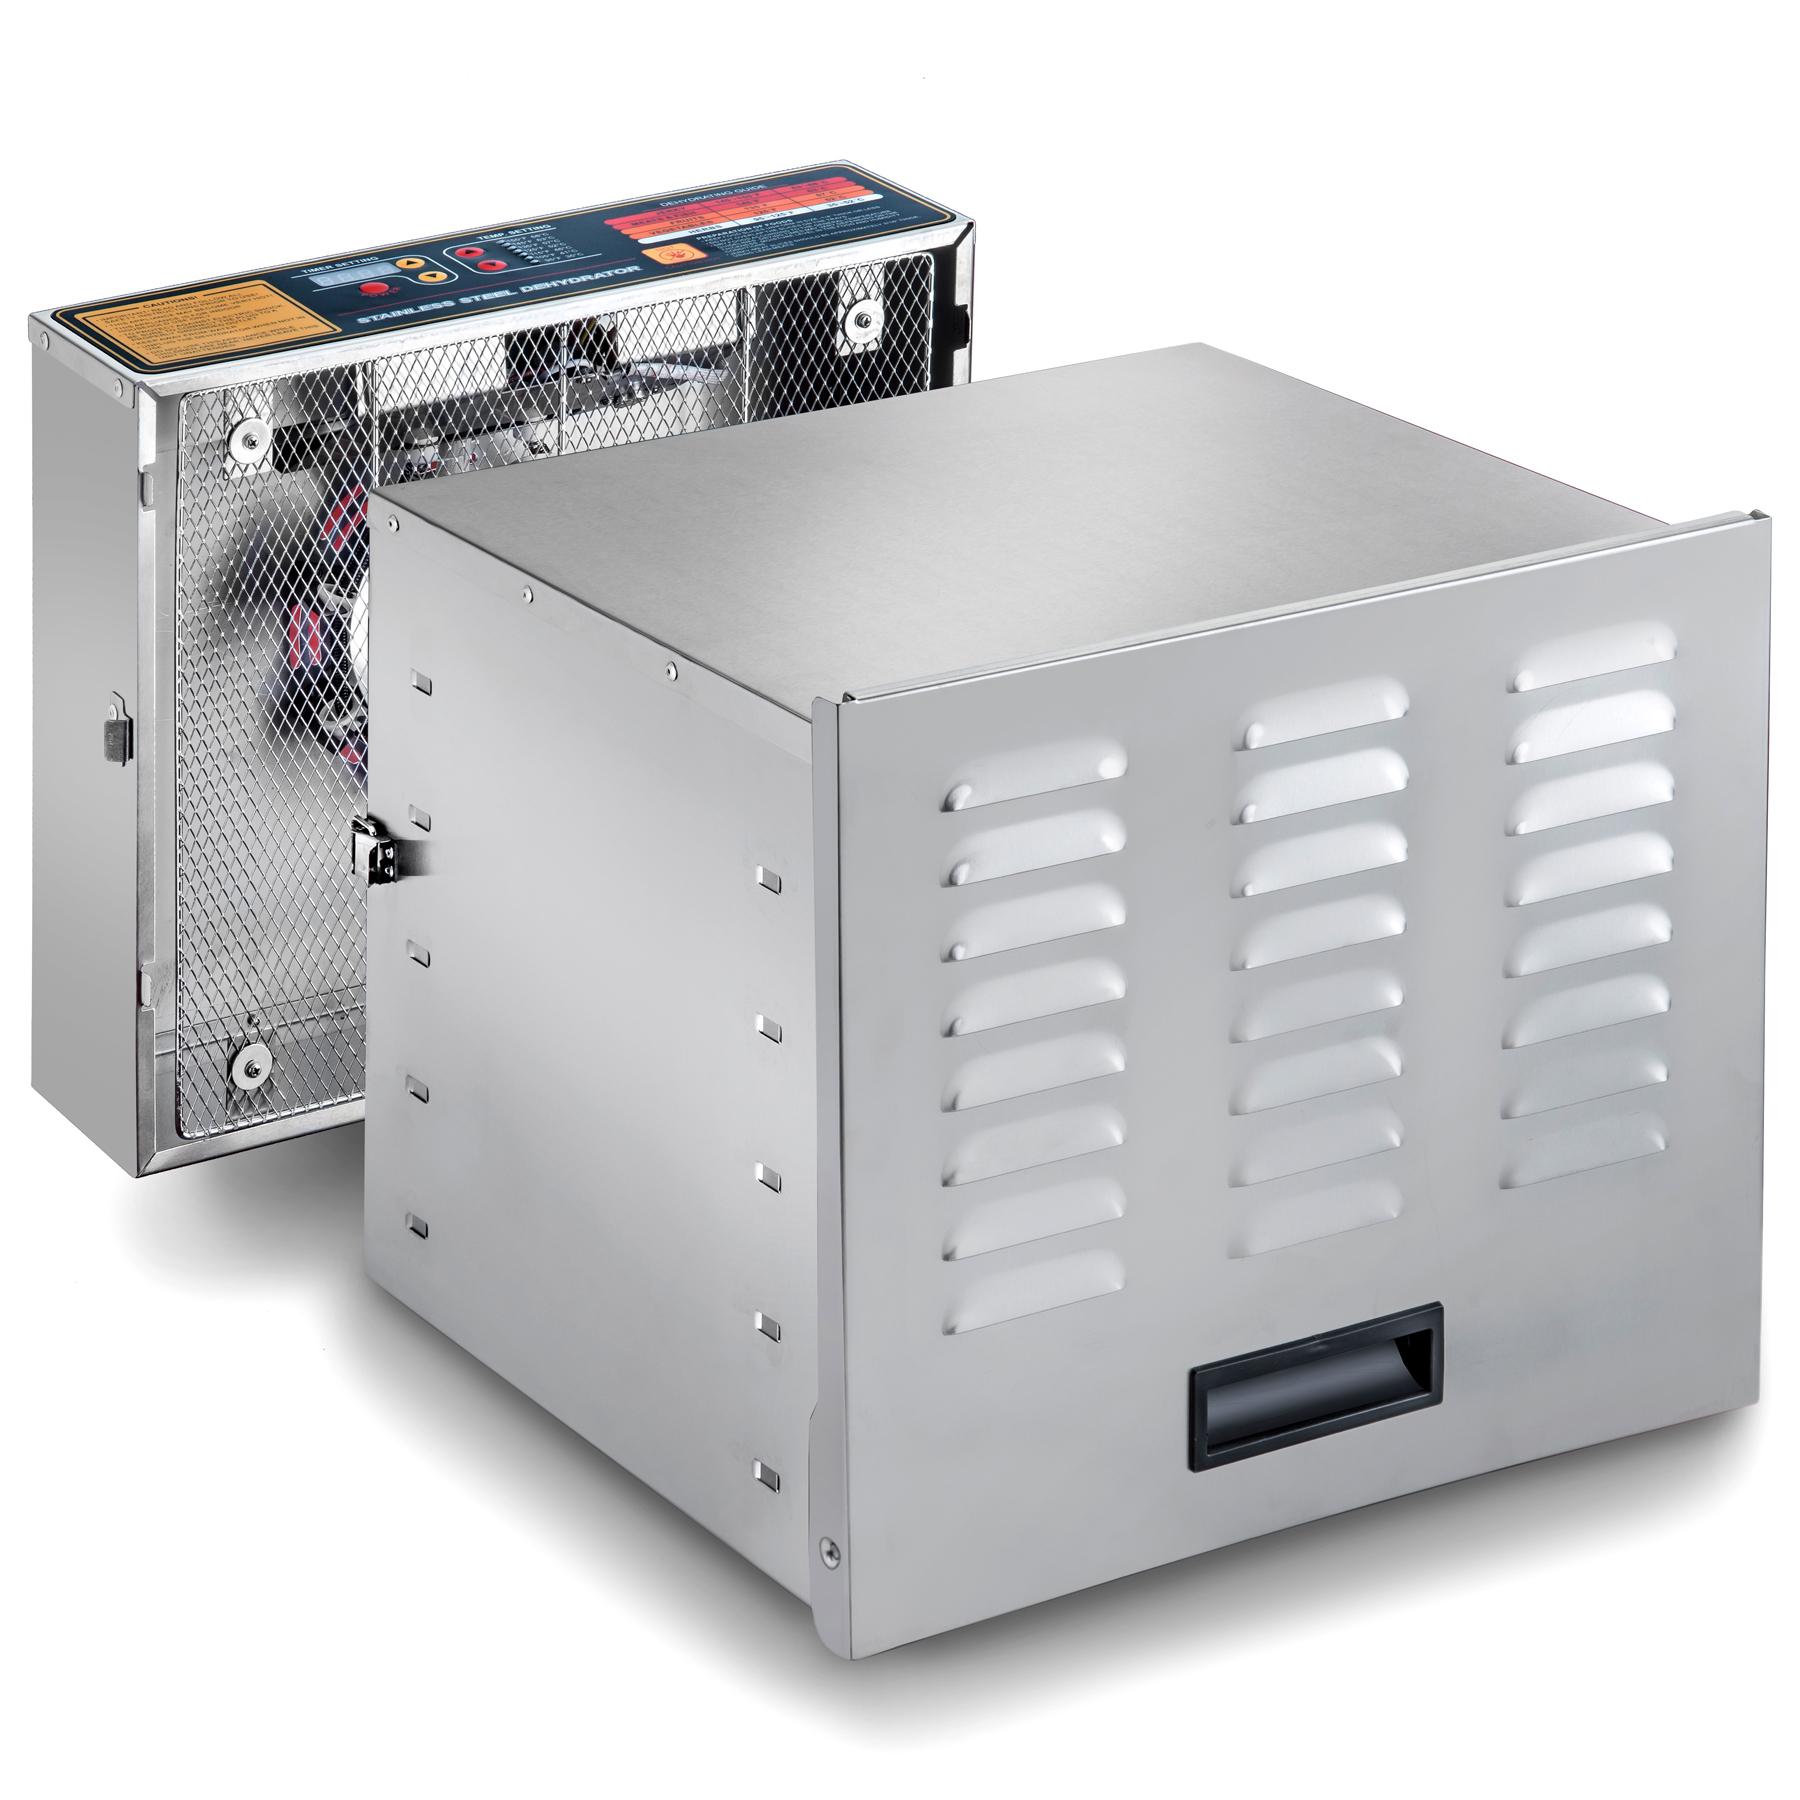 STX International Model# STX-DEH-1200W-XLS Dehydra 1200 W...